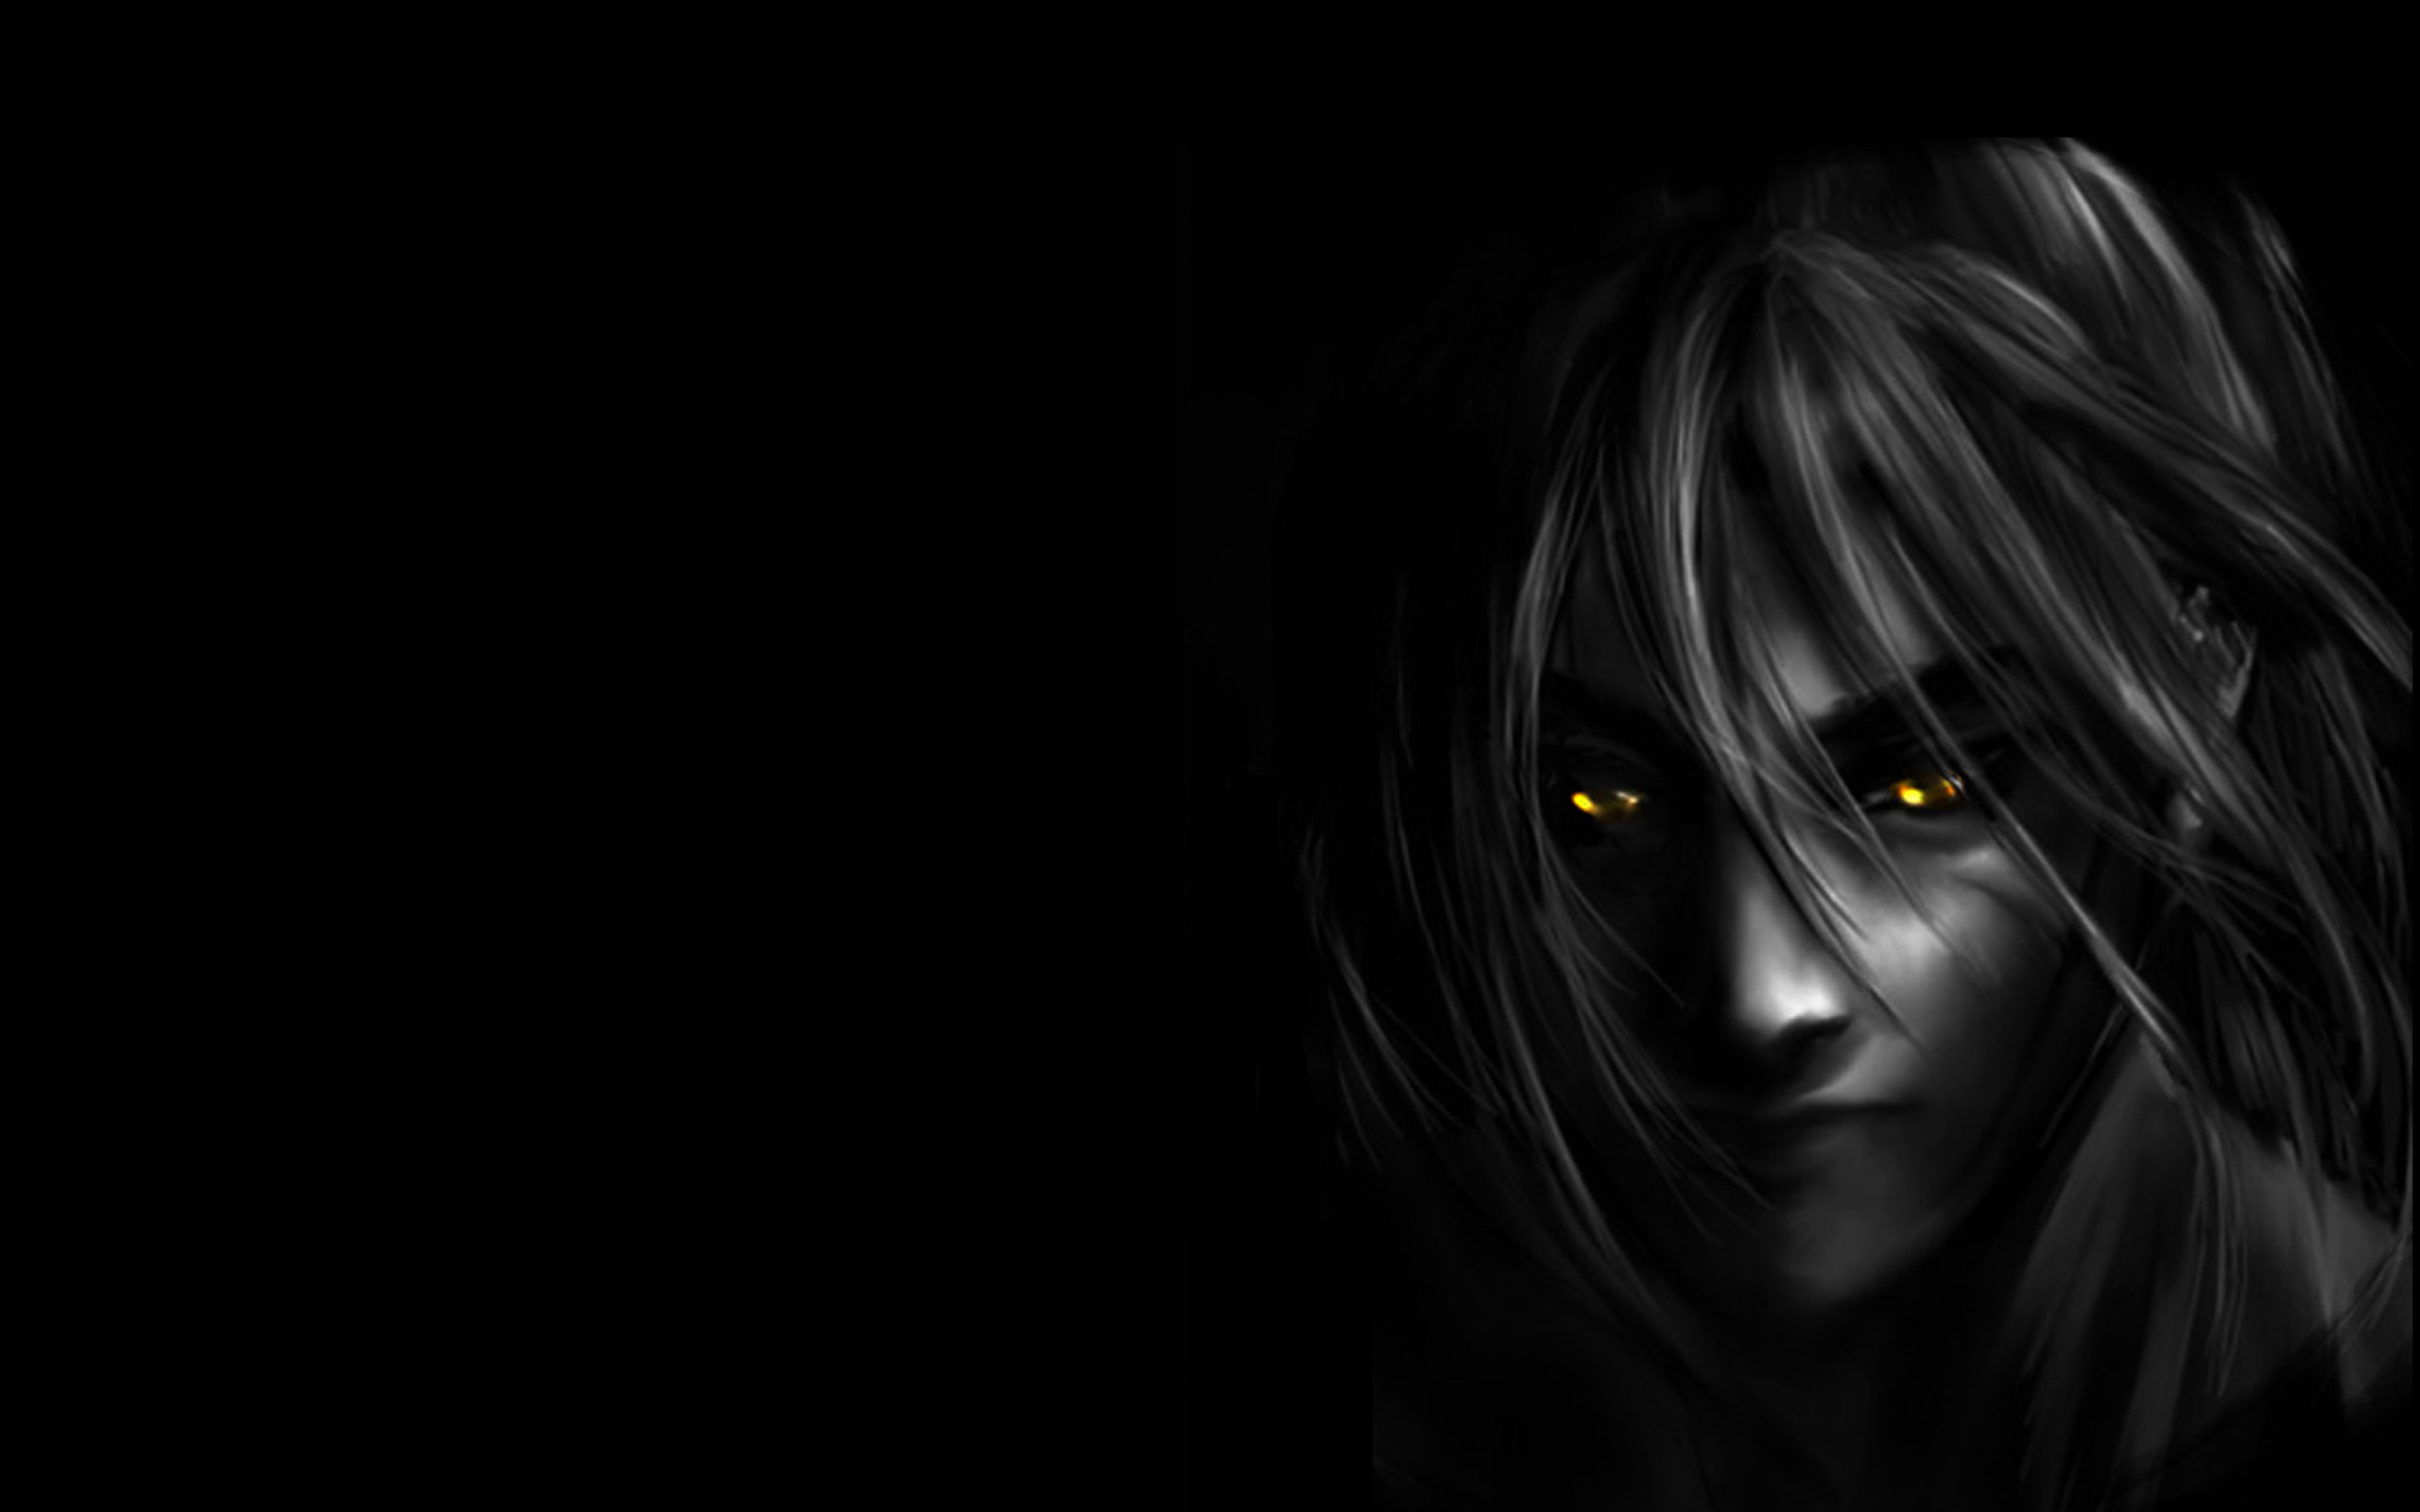 Dark Anime Backgrounds wallpaper wallpaper hd background desktop 2560x1600